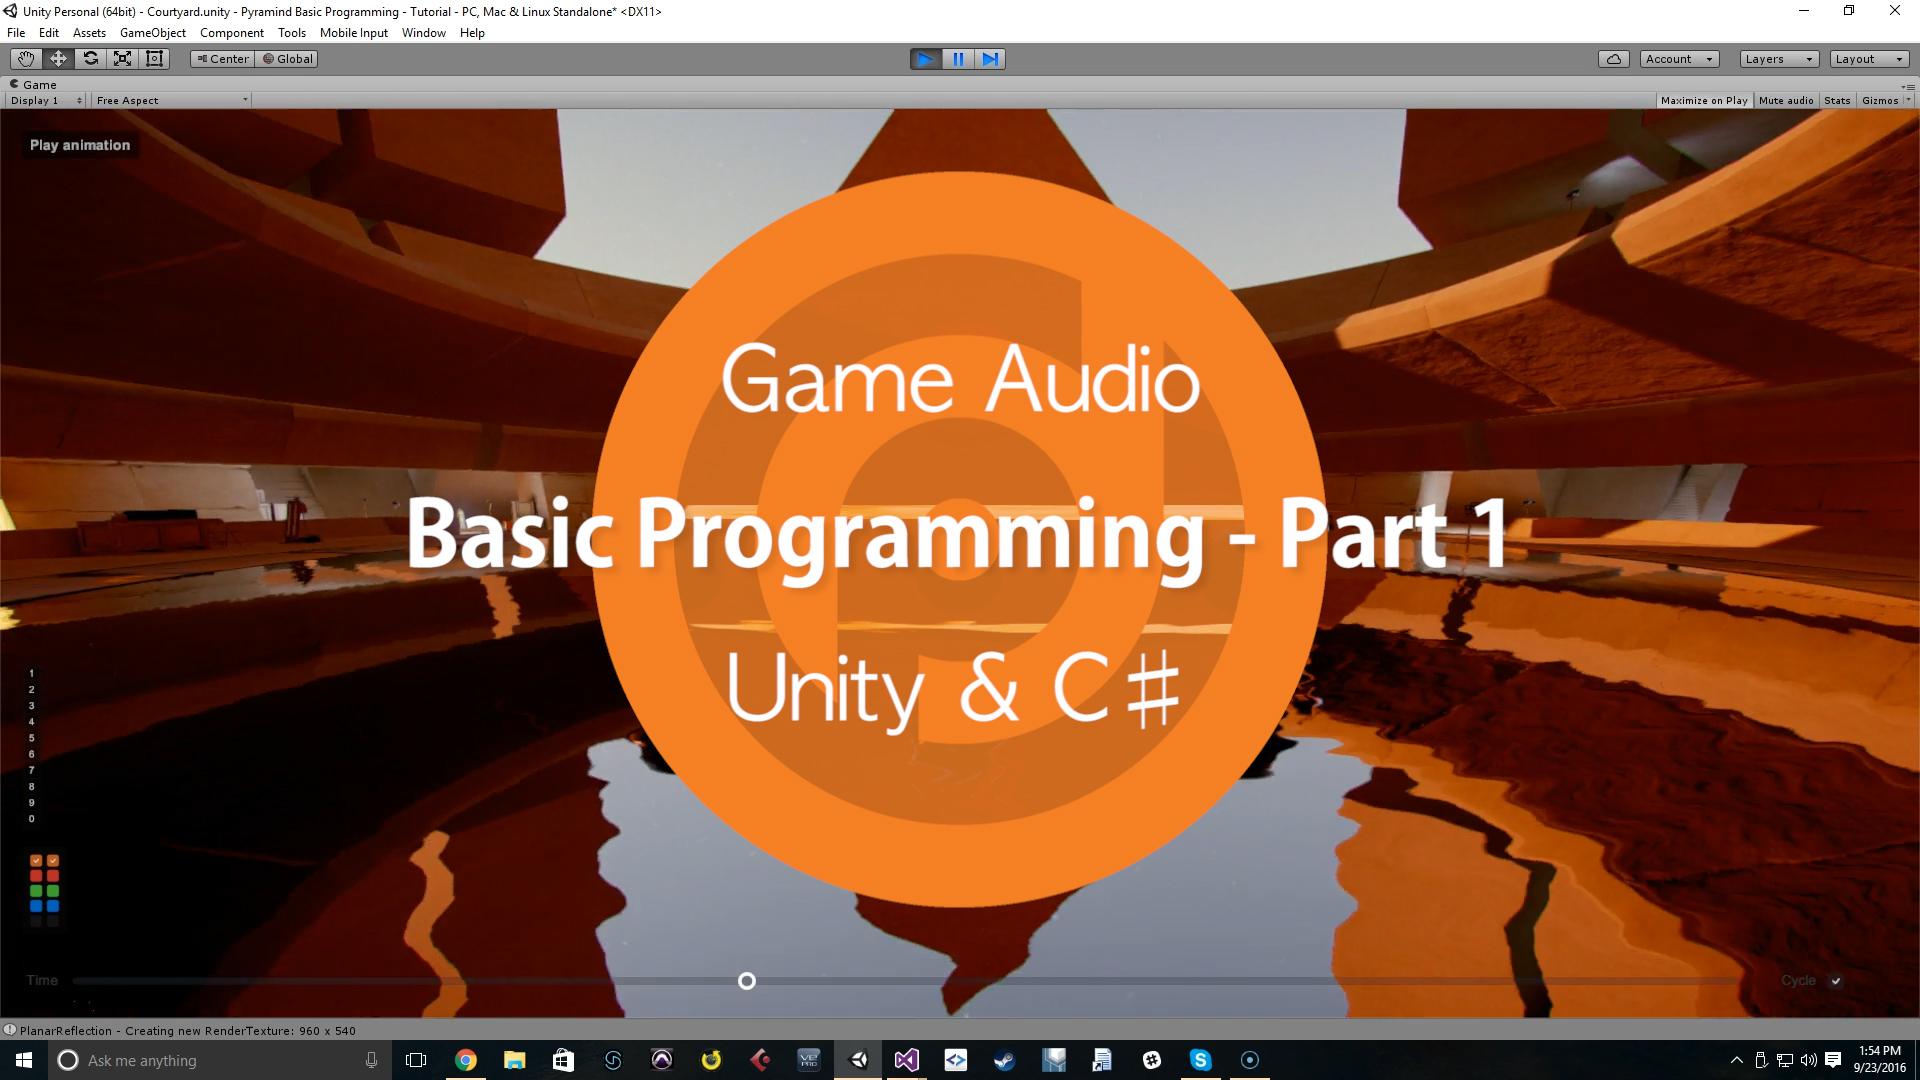 Game Audio | Basic Programming - Part 1 | Unity & C♯ - Pyramind